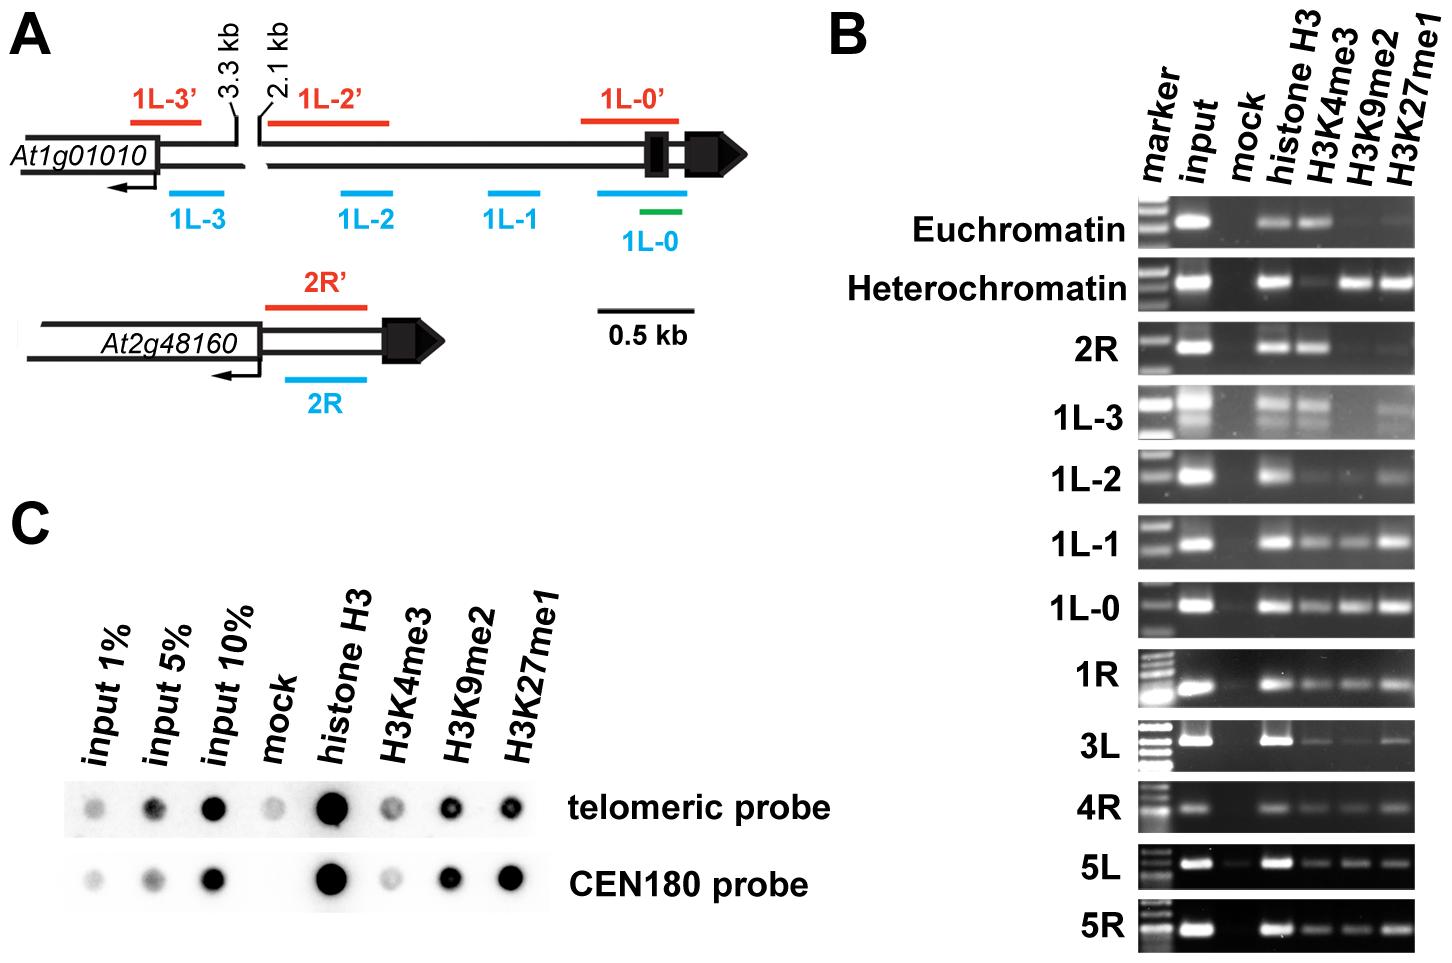 Chromatin structure of <i>Arabidopsis</i> chromosome termini.